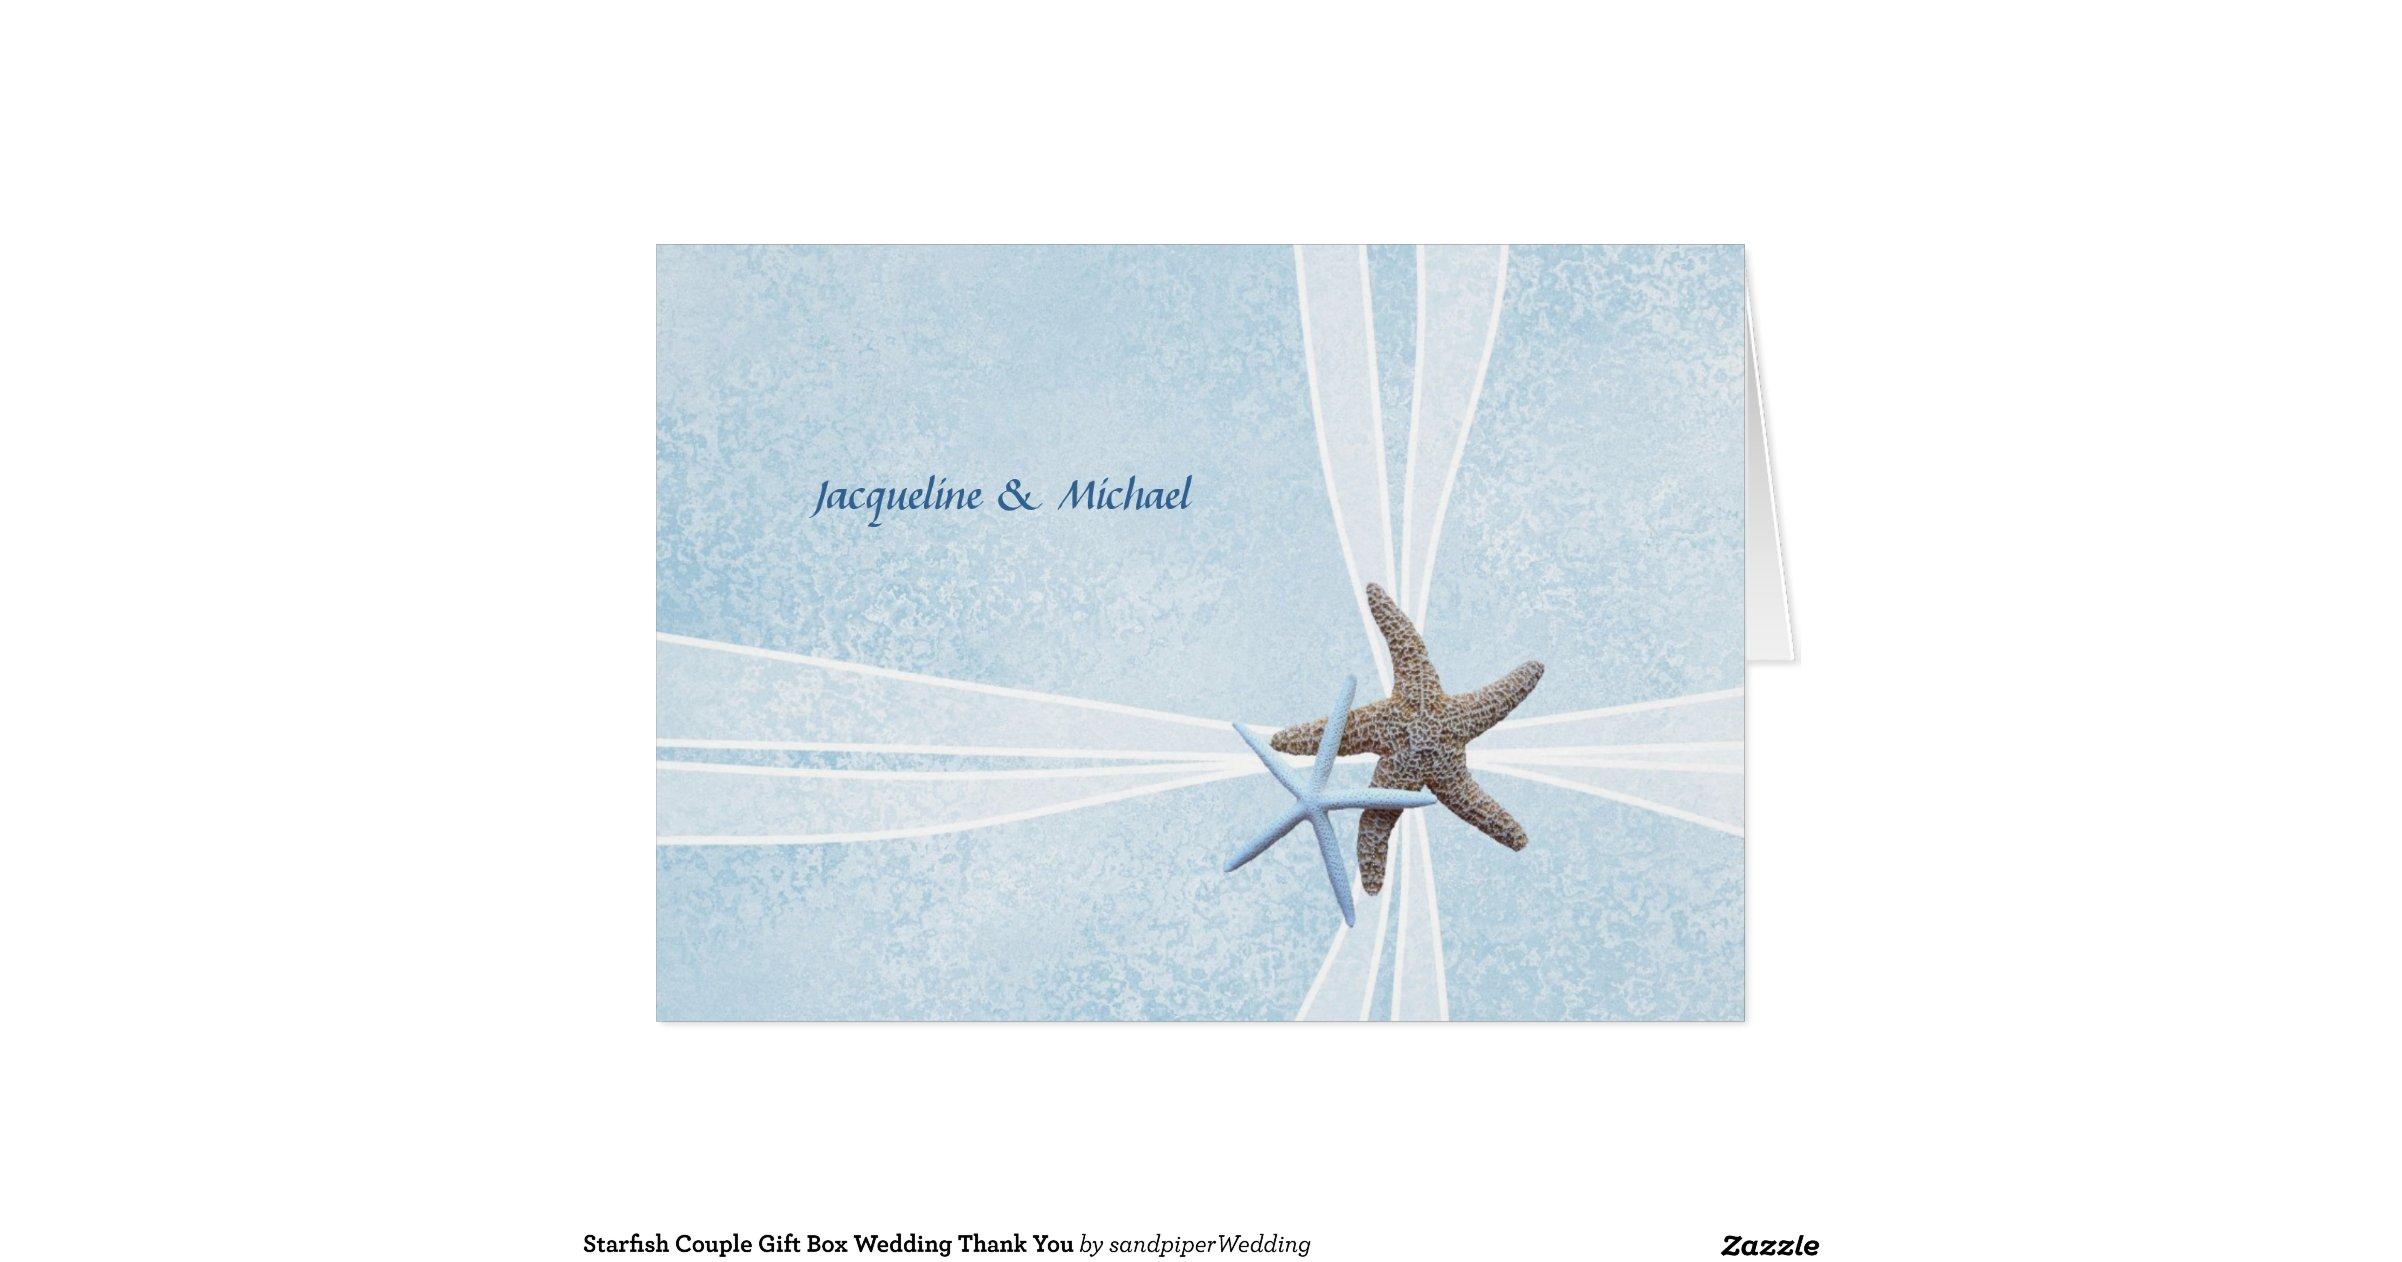 Wedding Thank You Gift Box : starfish_couple_gift_box_wedding_thank_you_cards ...